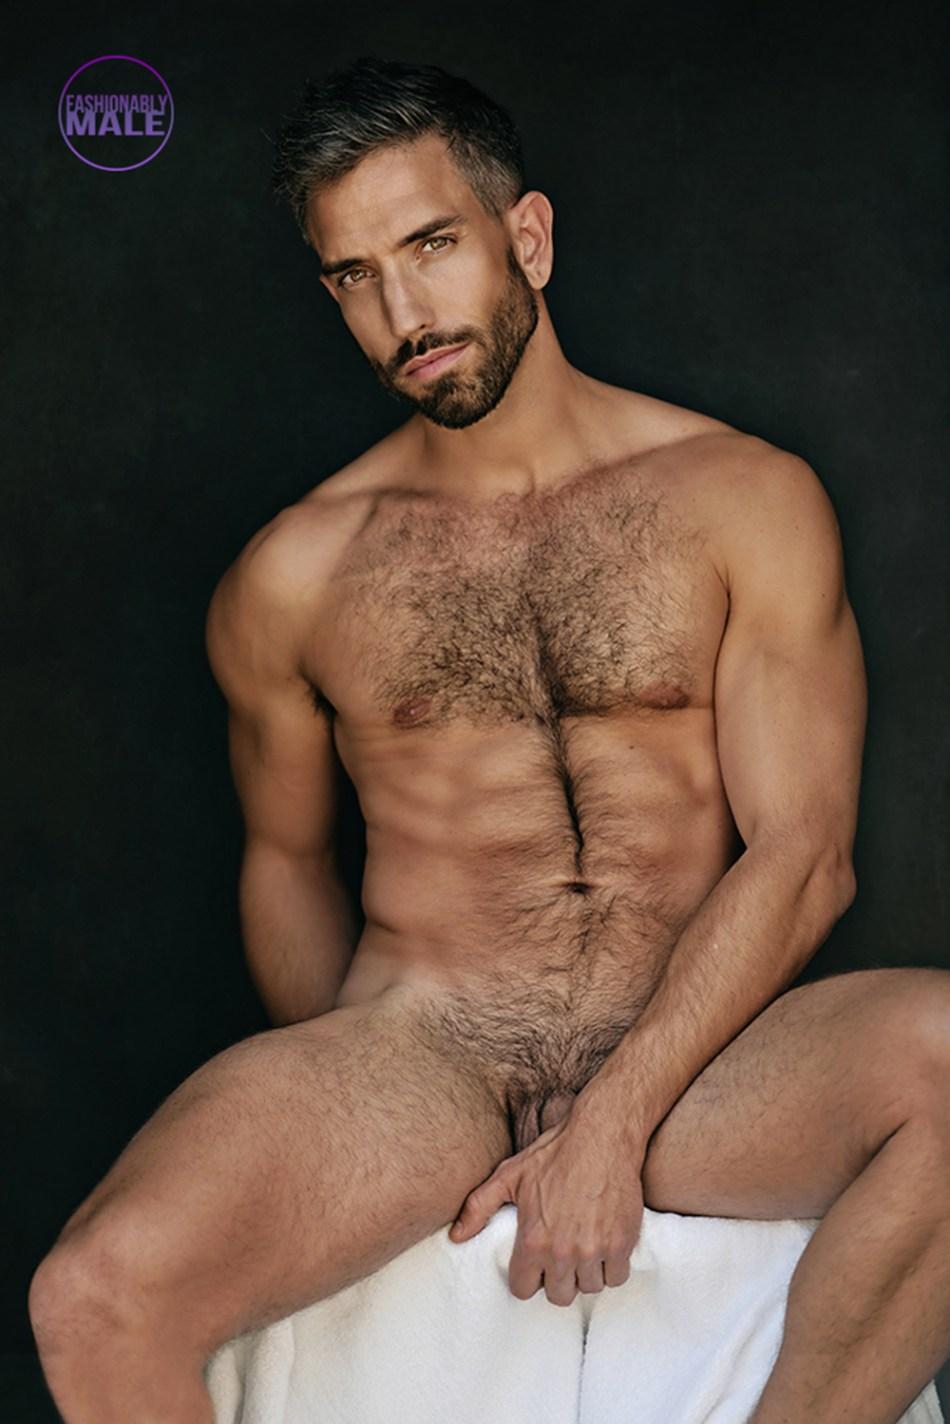 Stephane Marti by Shotsbygun for Fashionably Male9